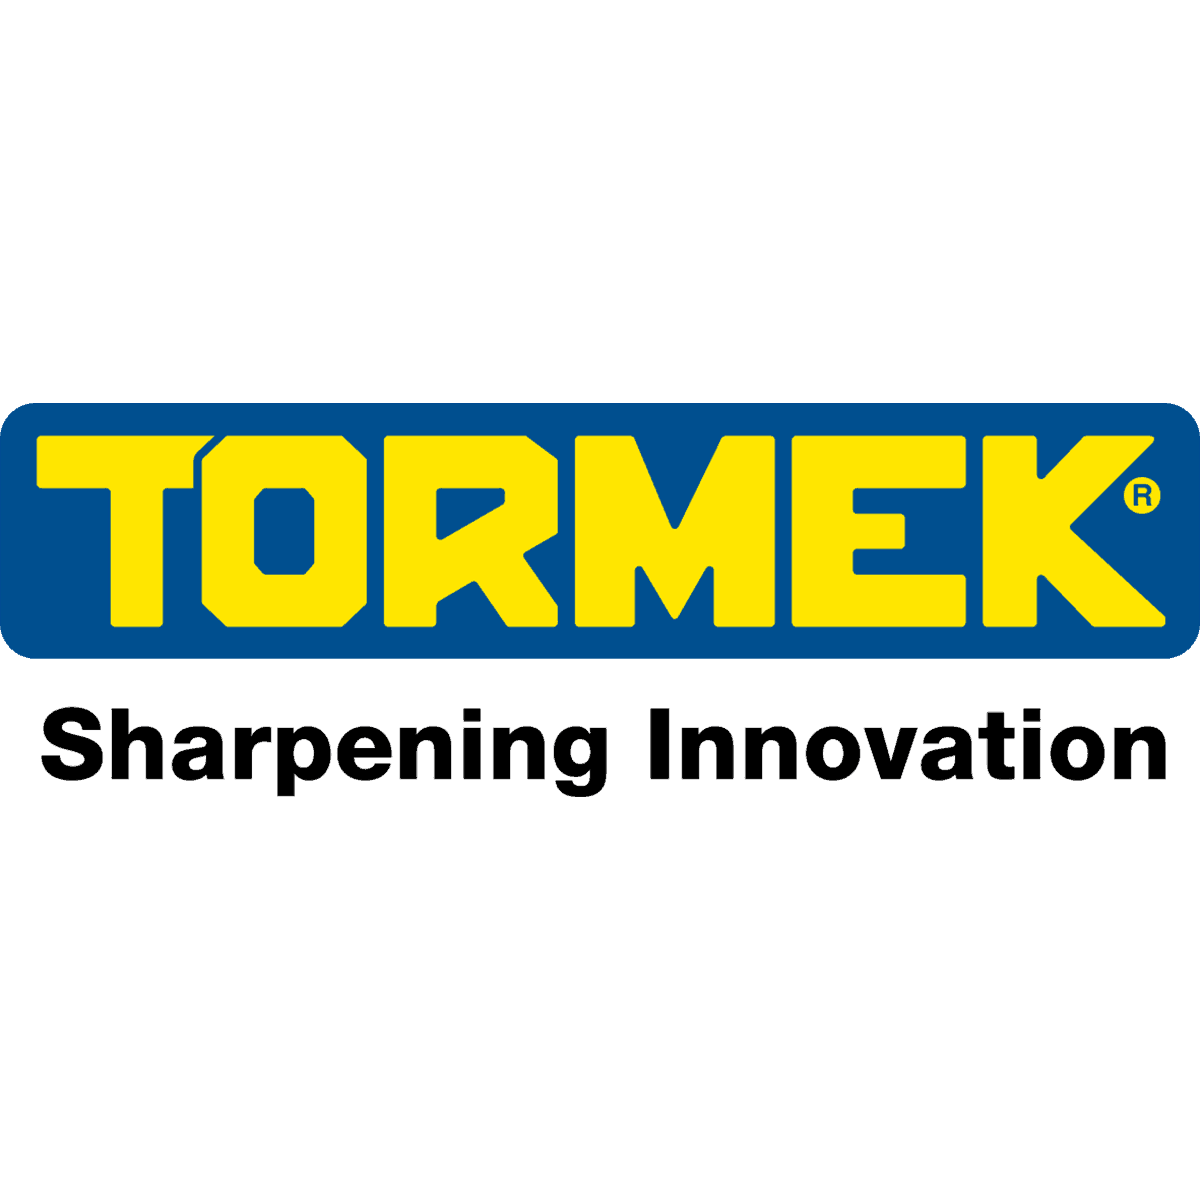 https://www.tormek.com/